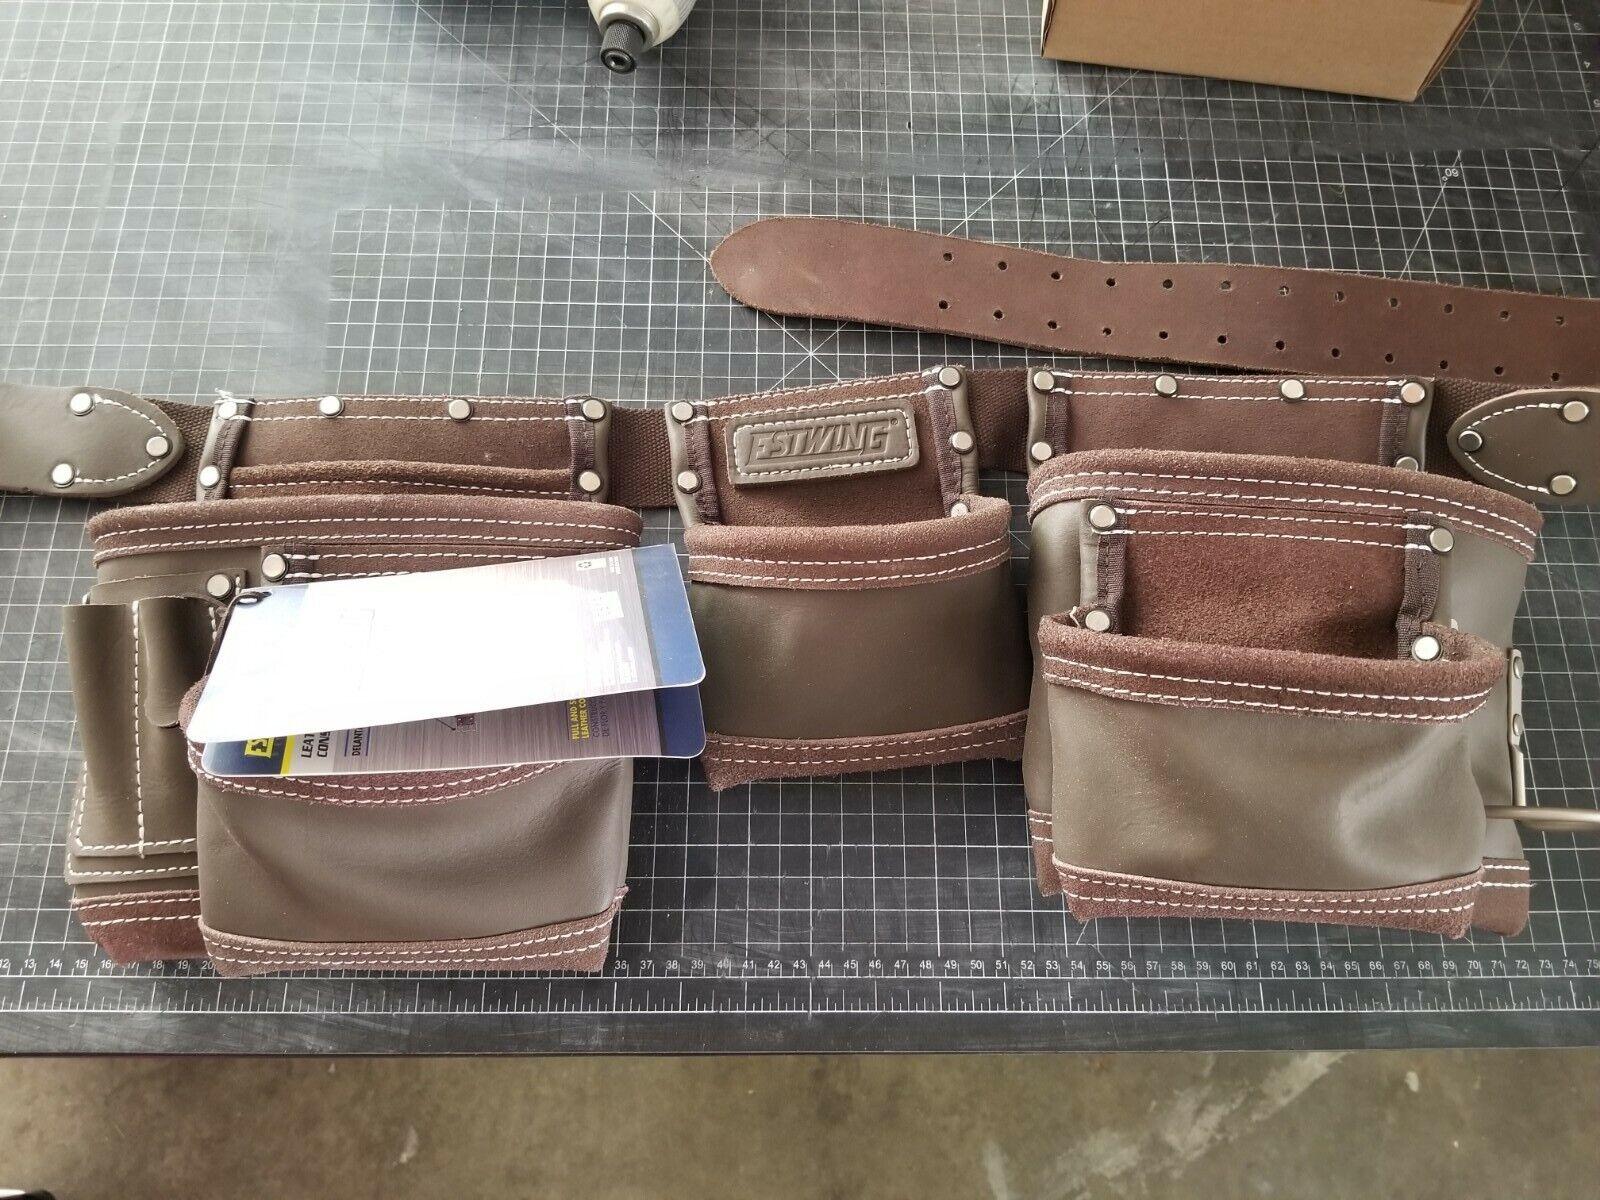 Estwing 7 Pocket Leather Tool Belt Pouch Apron Set 94744